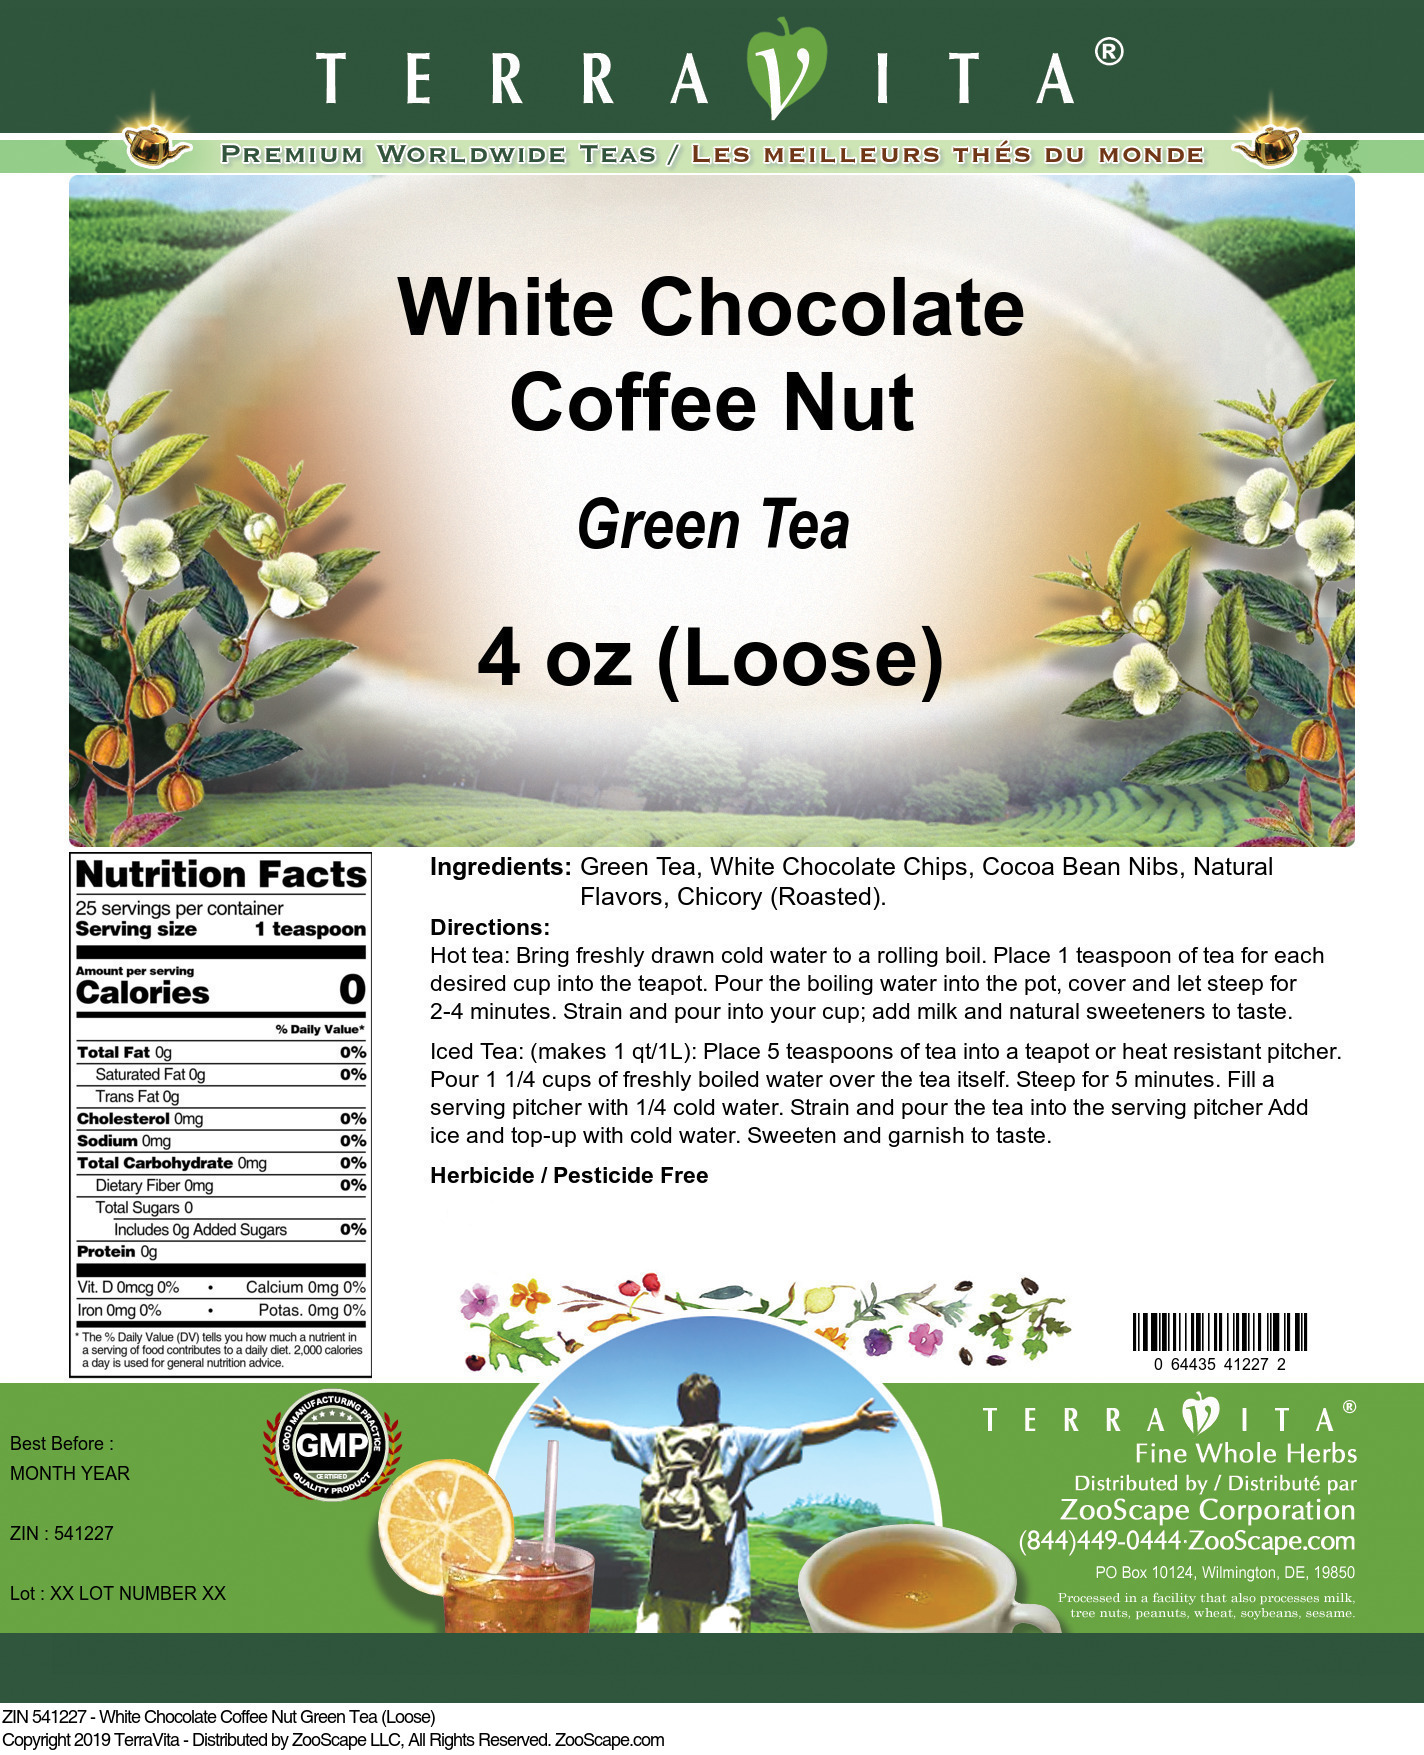 White Chocolate Coffee Nut Green Tea